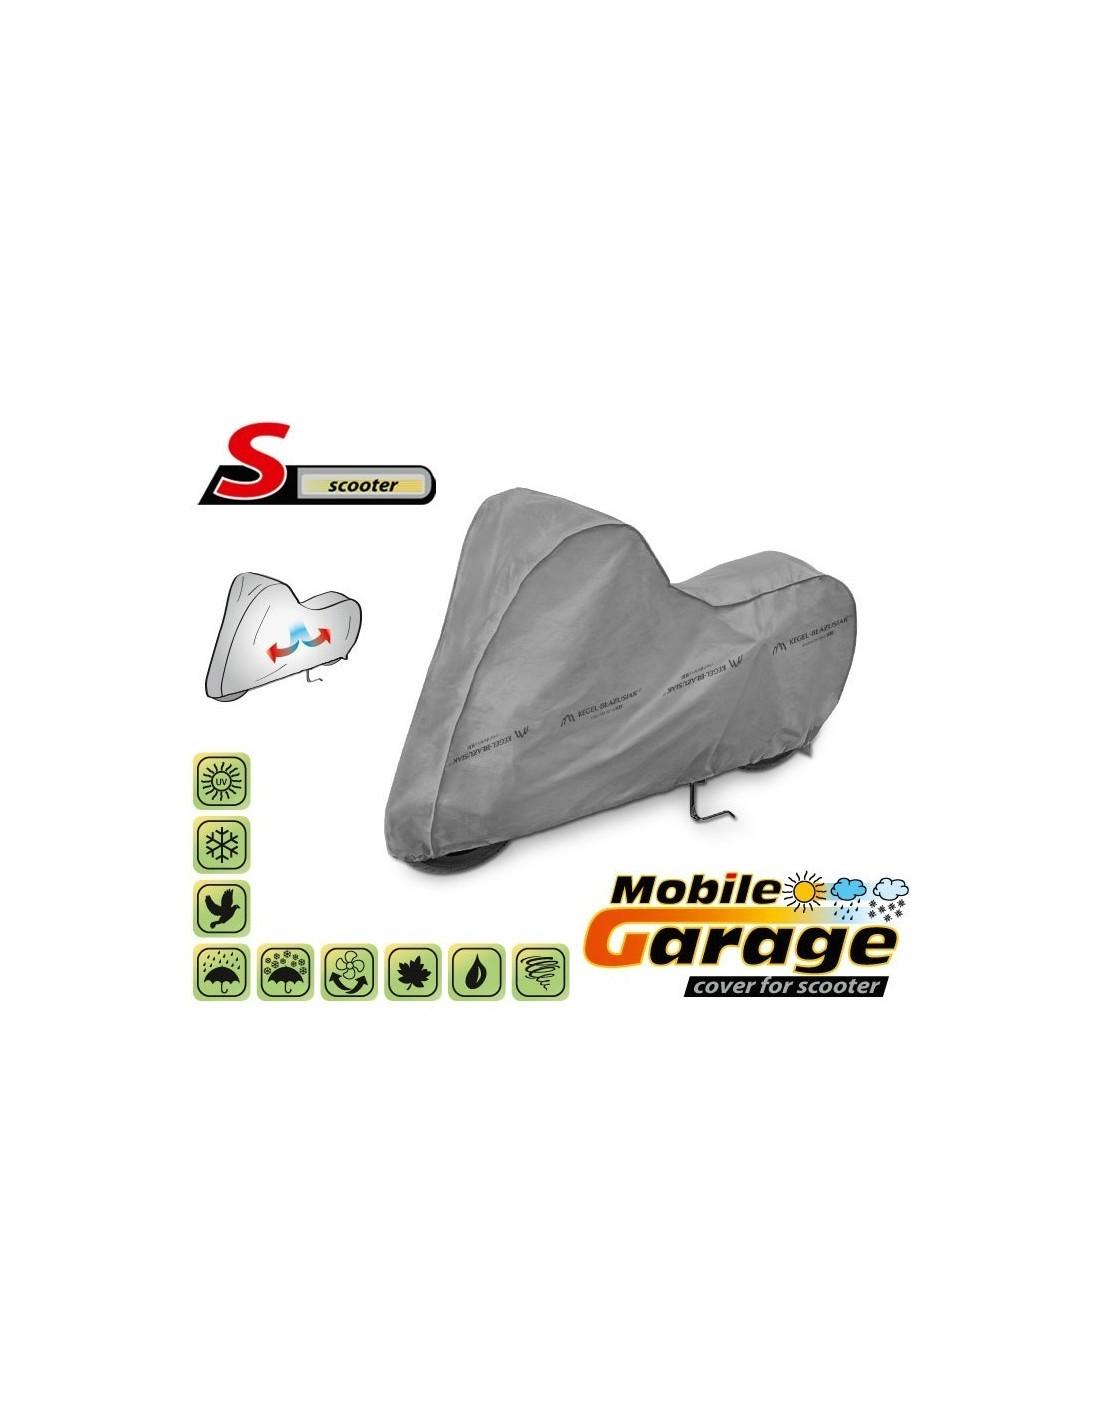 Funda para scooter Mobile Garage S